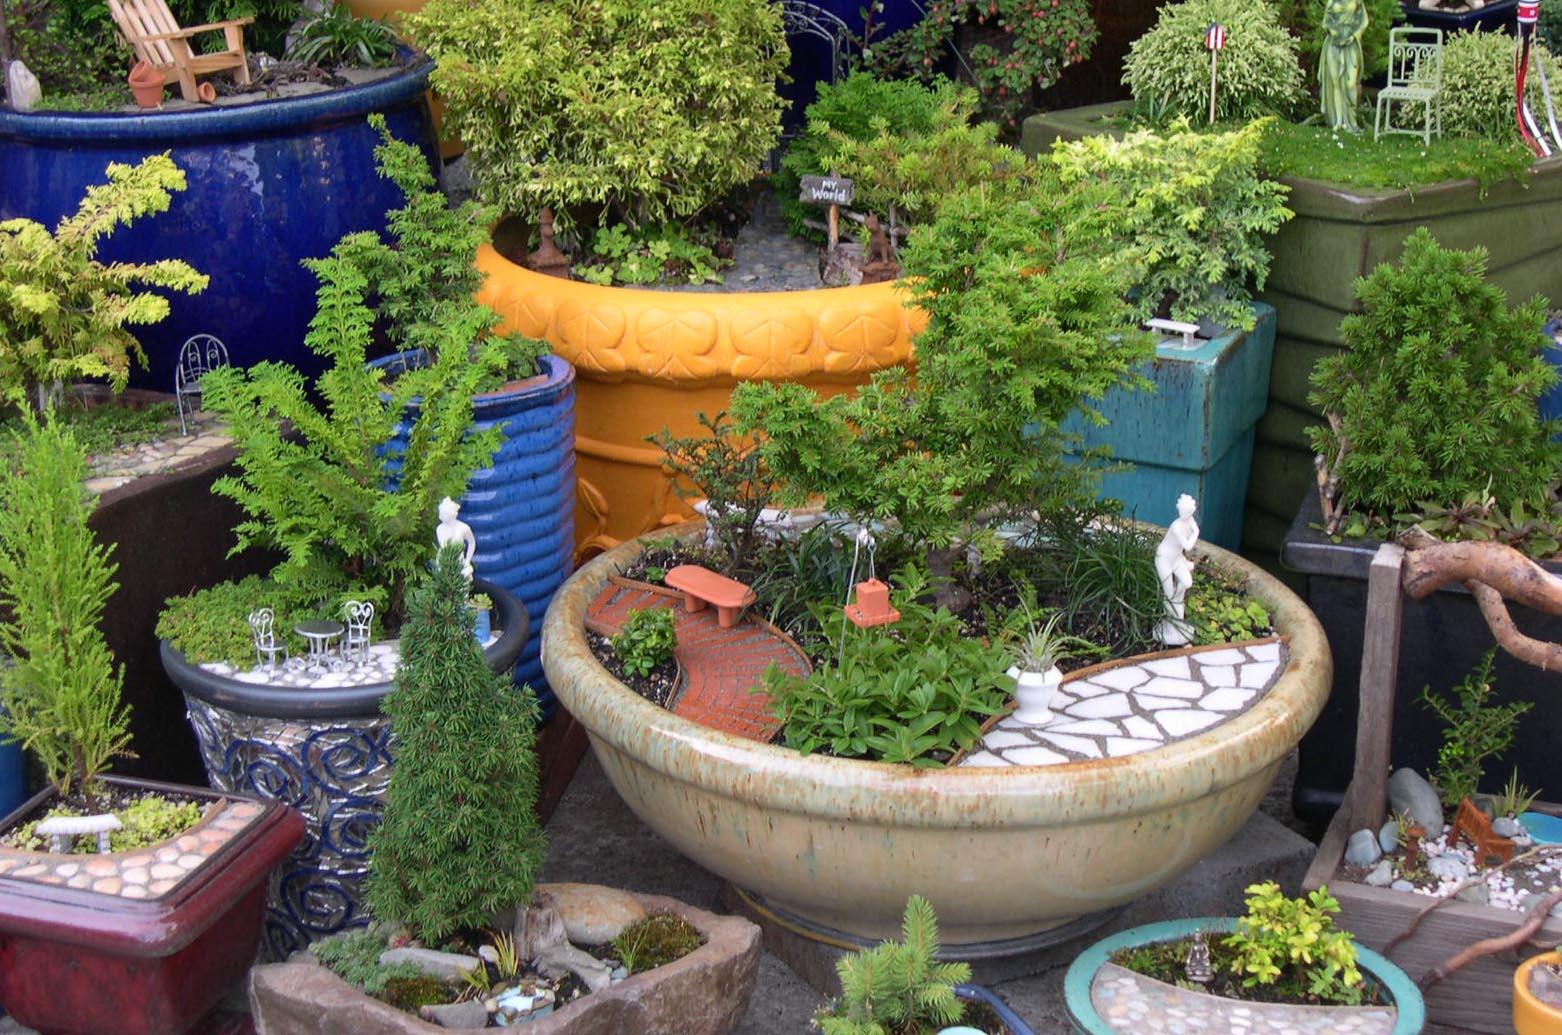 Miniature Items for Fairy Gardens